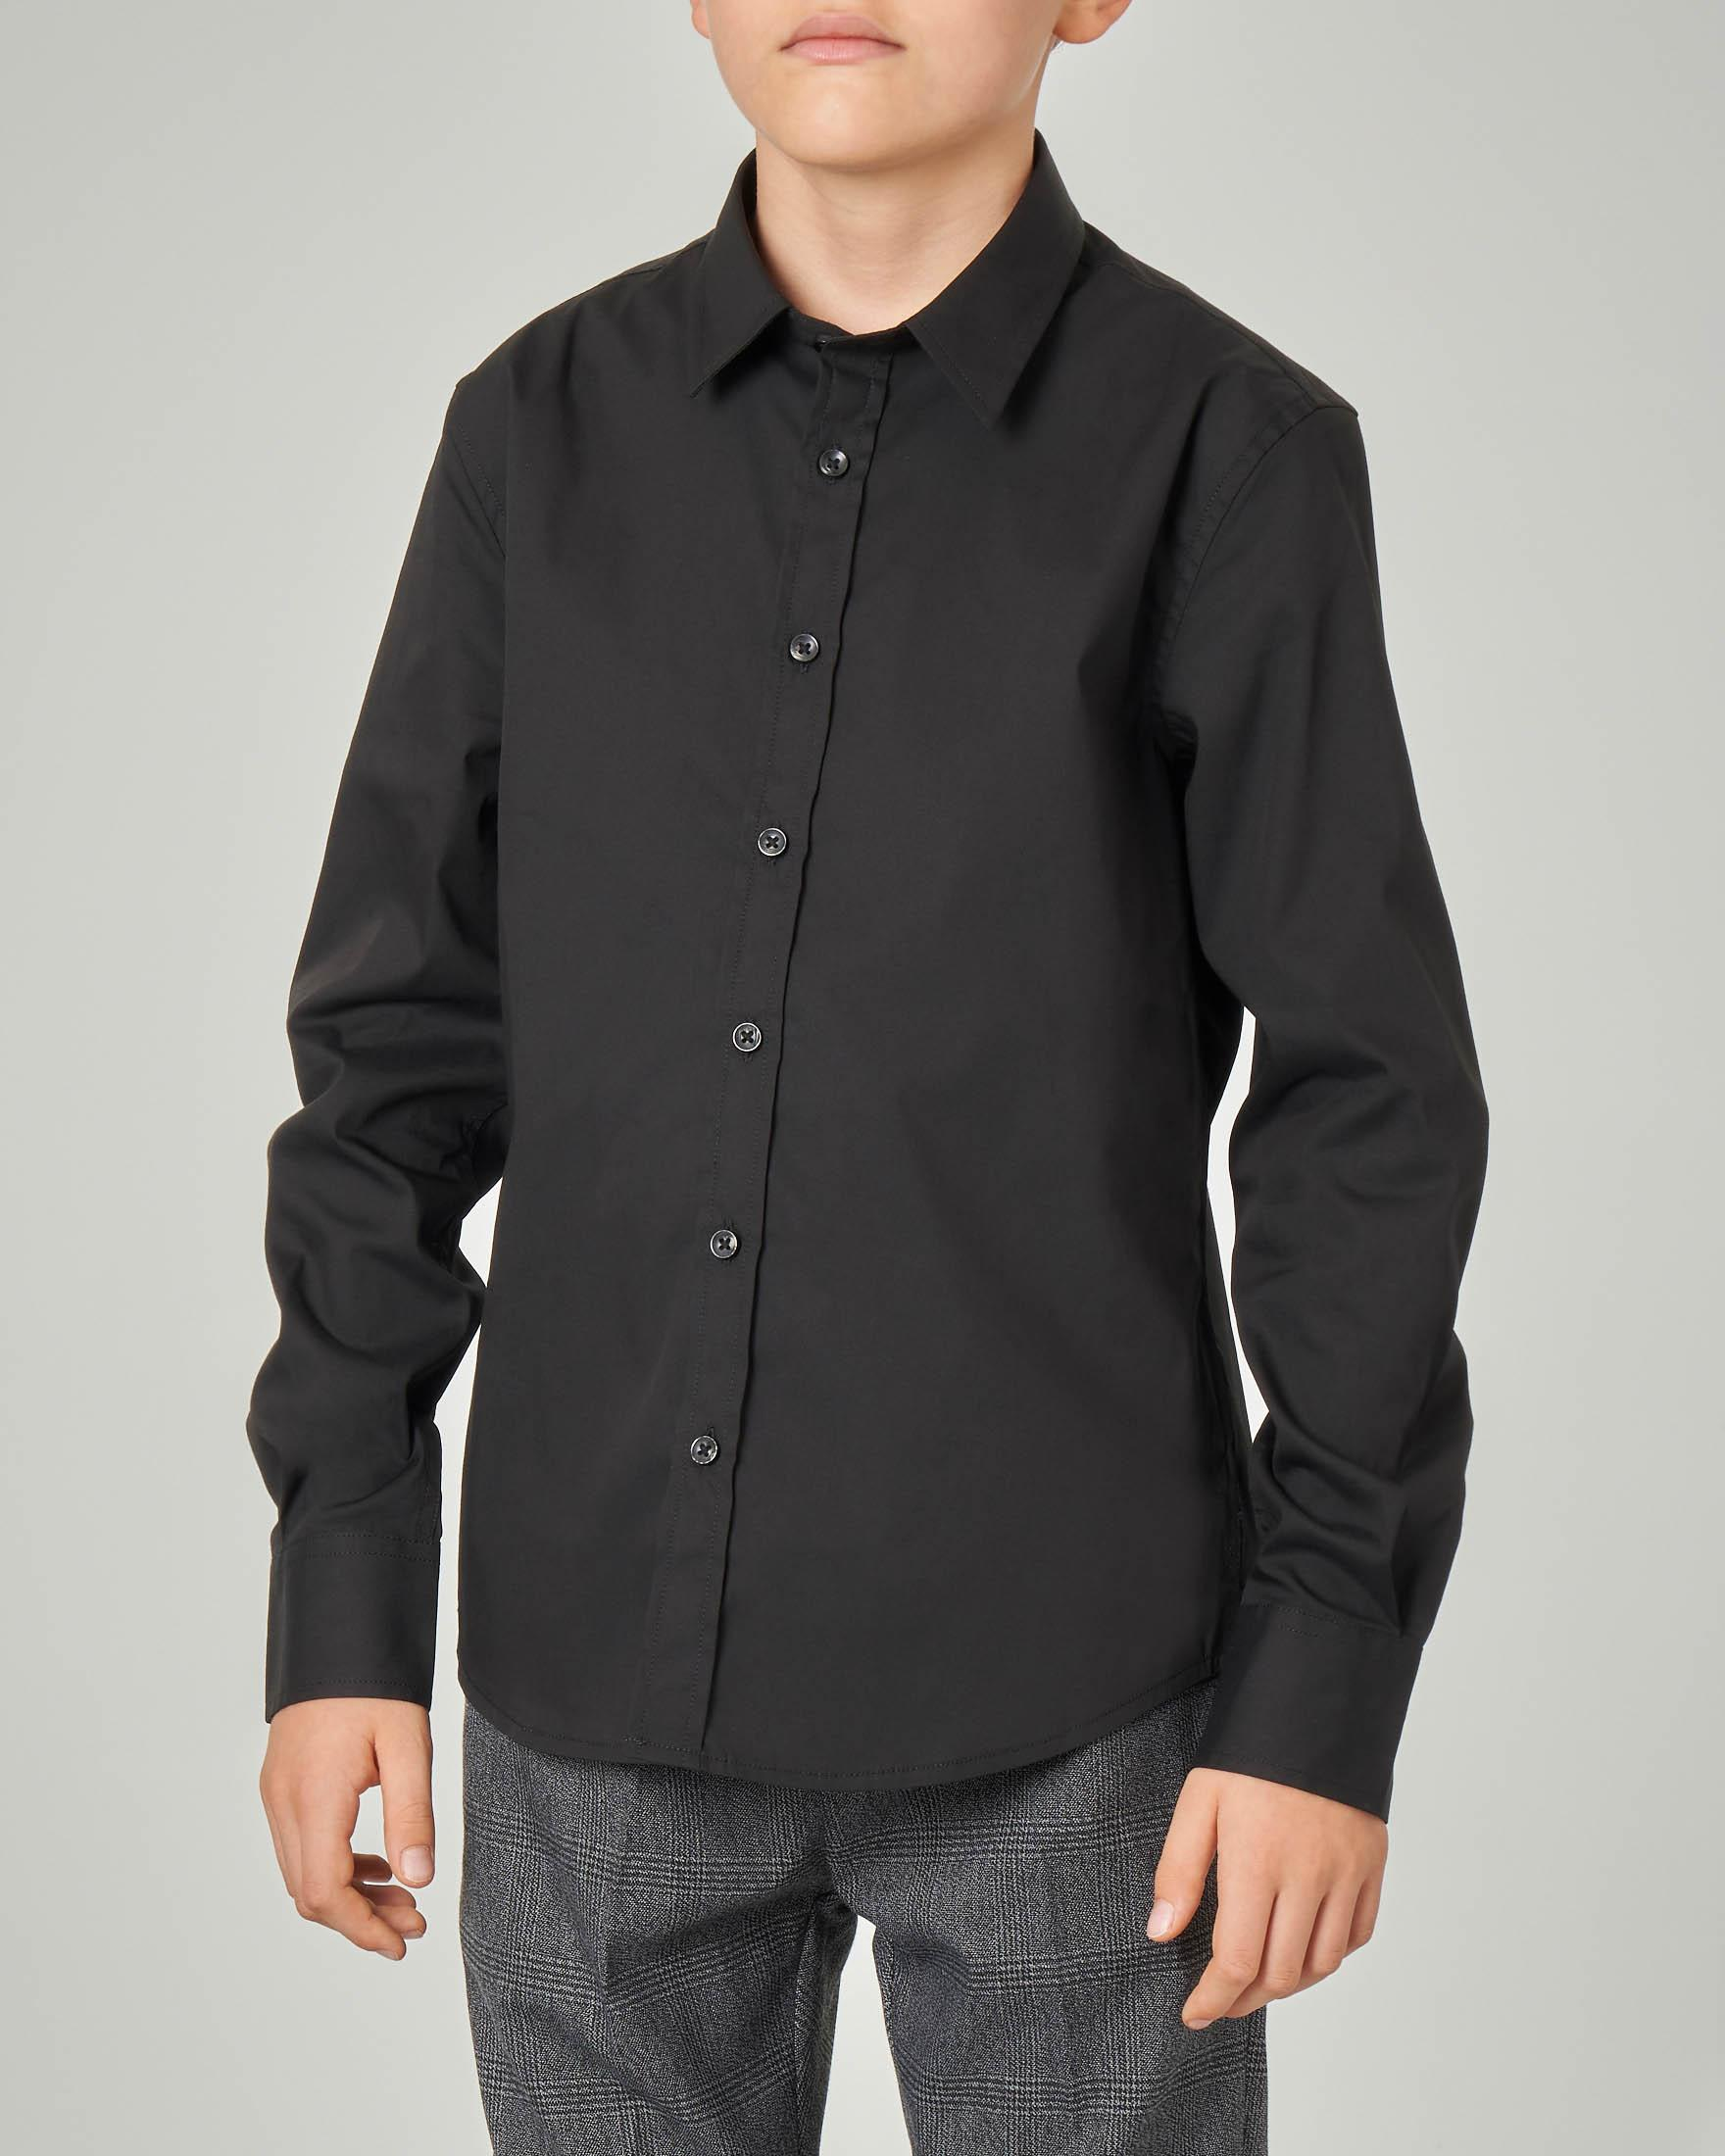 Camicia nera in cotone stretch 8-16 anni